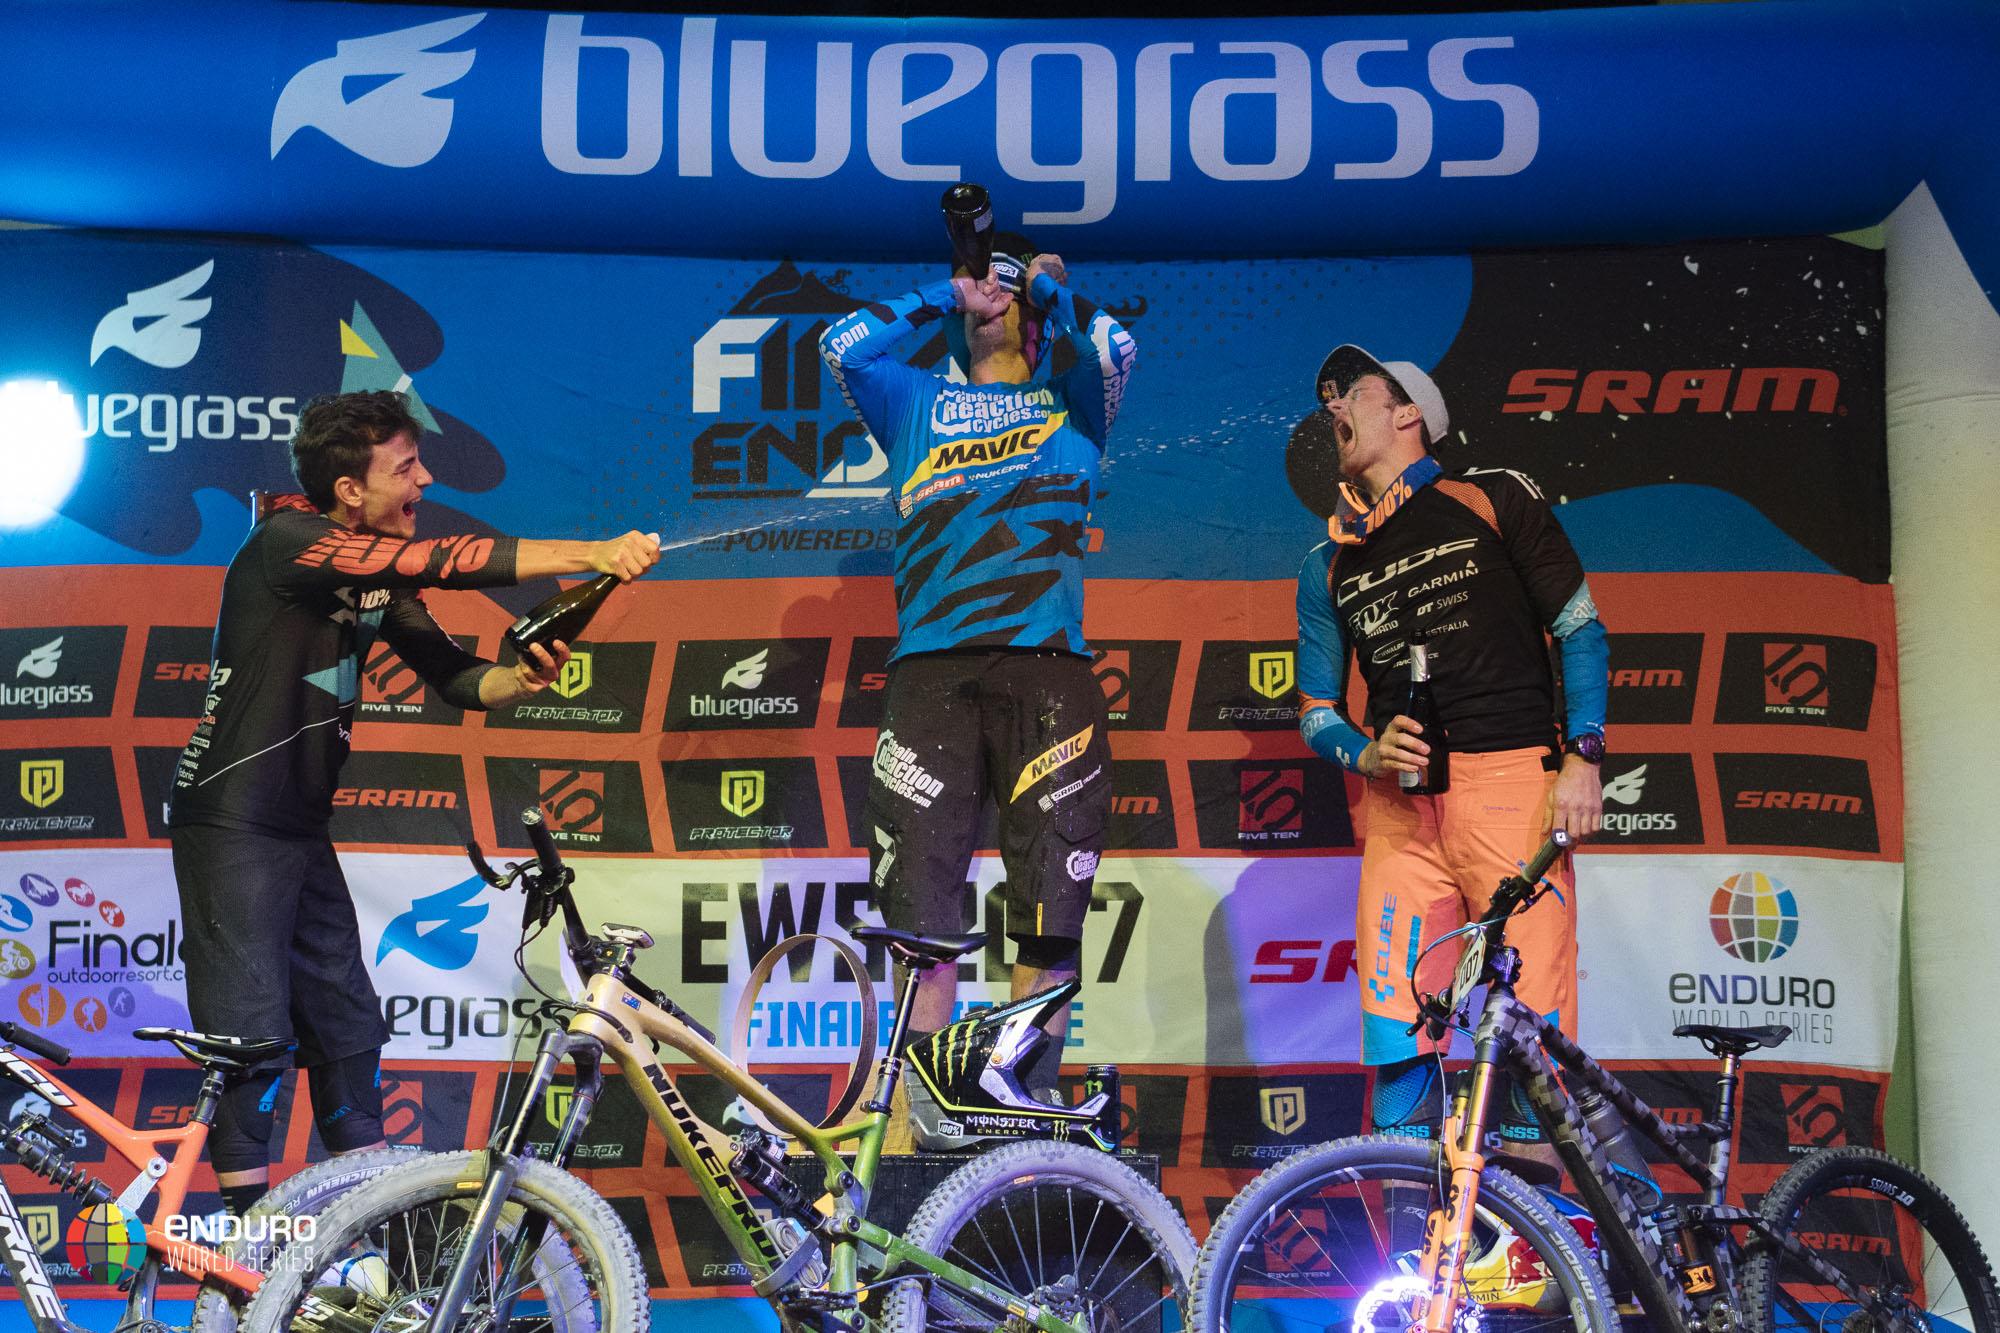 ews finale ligure 2017 podium